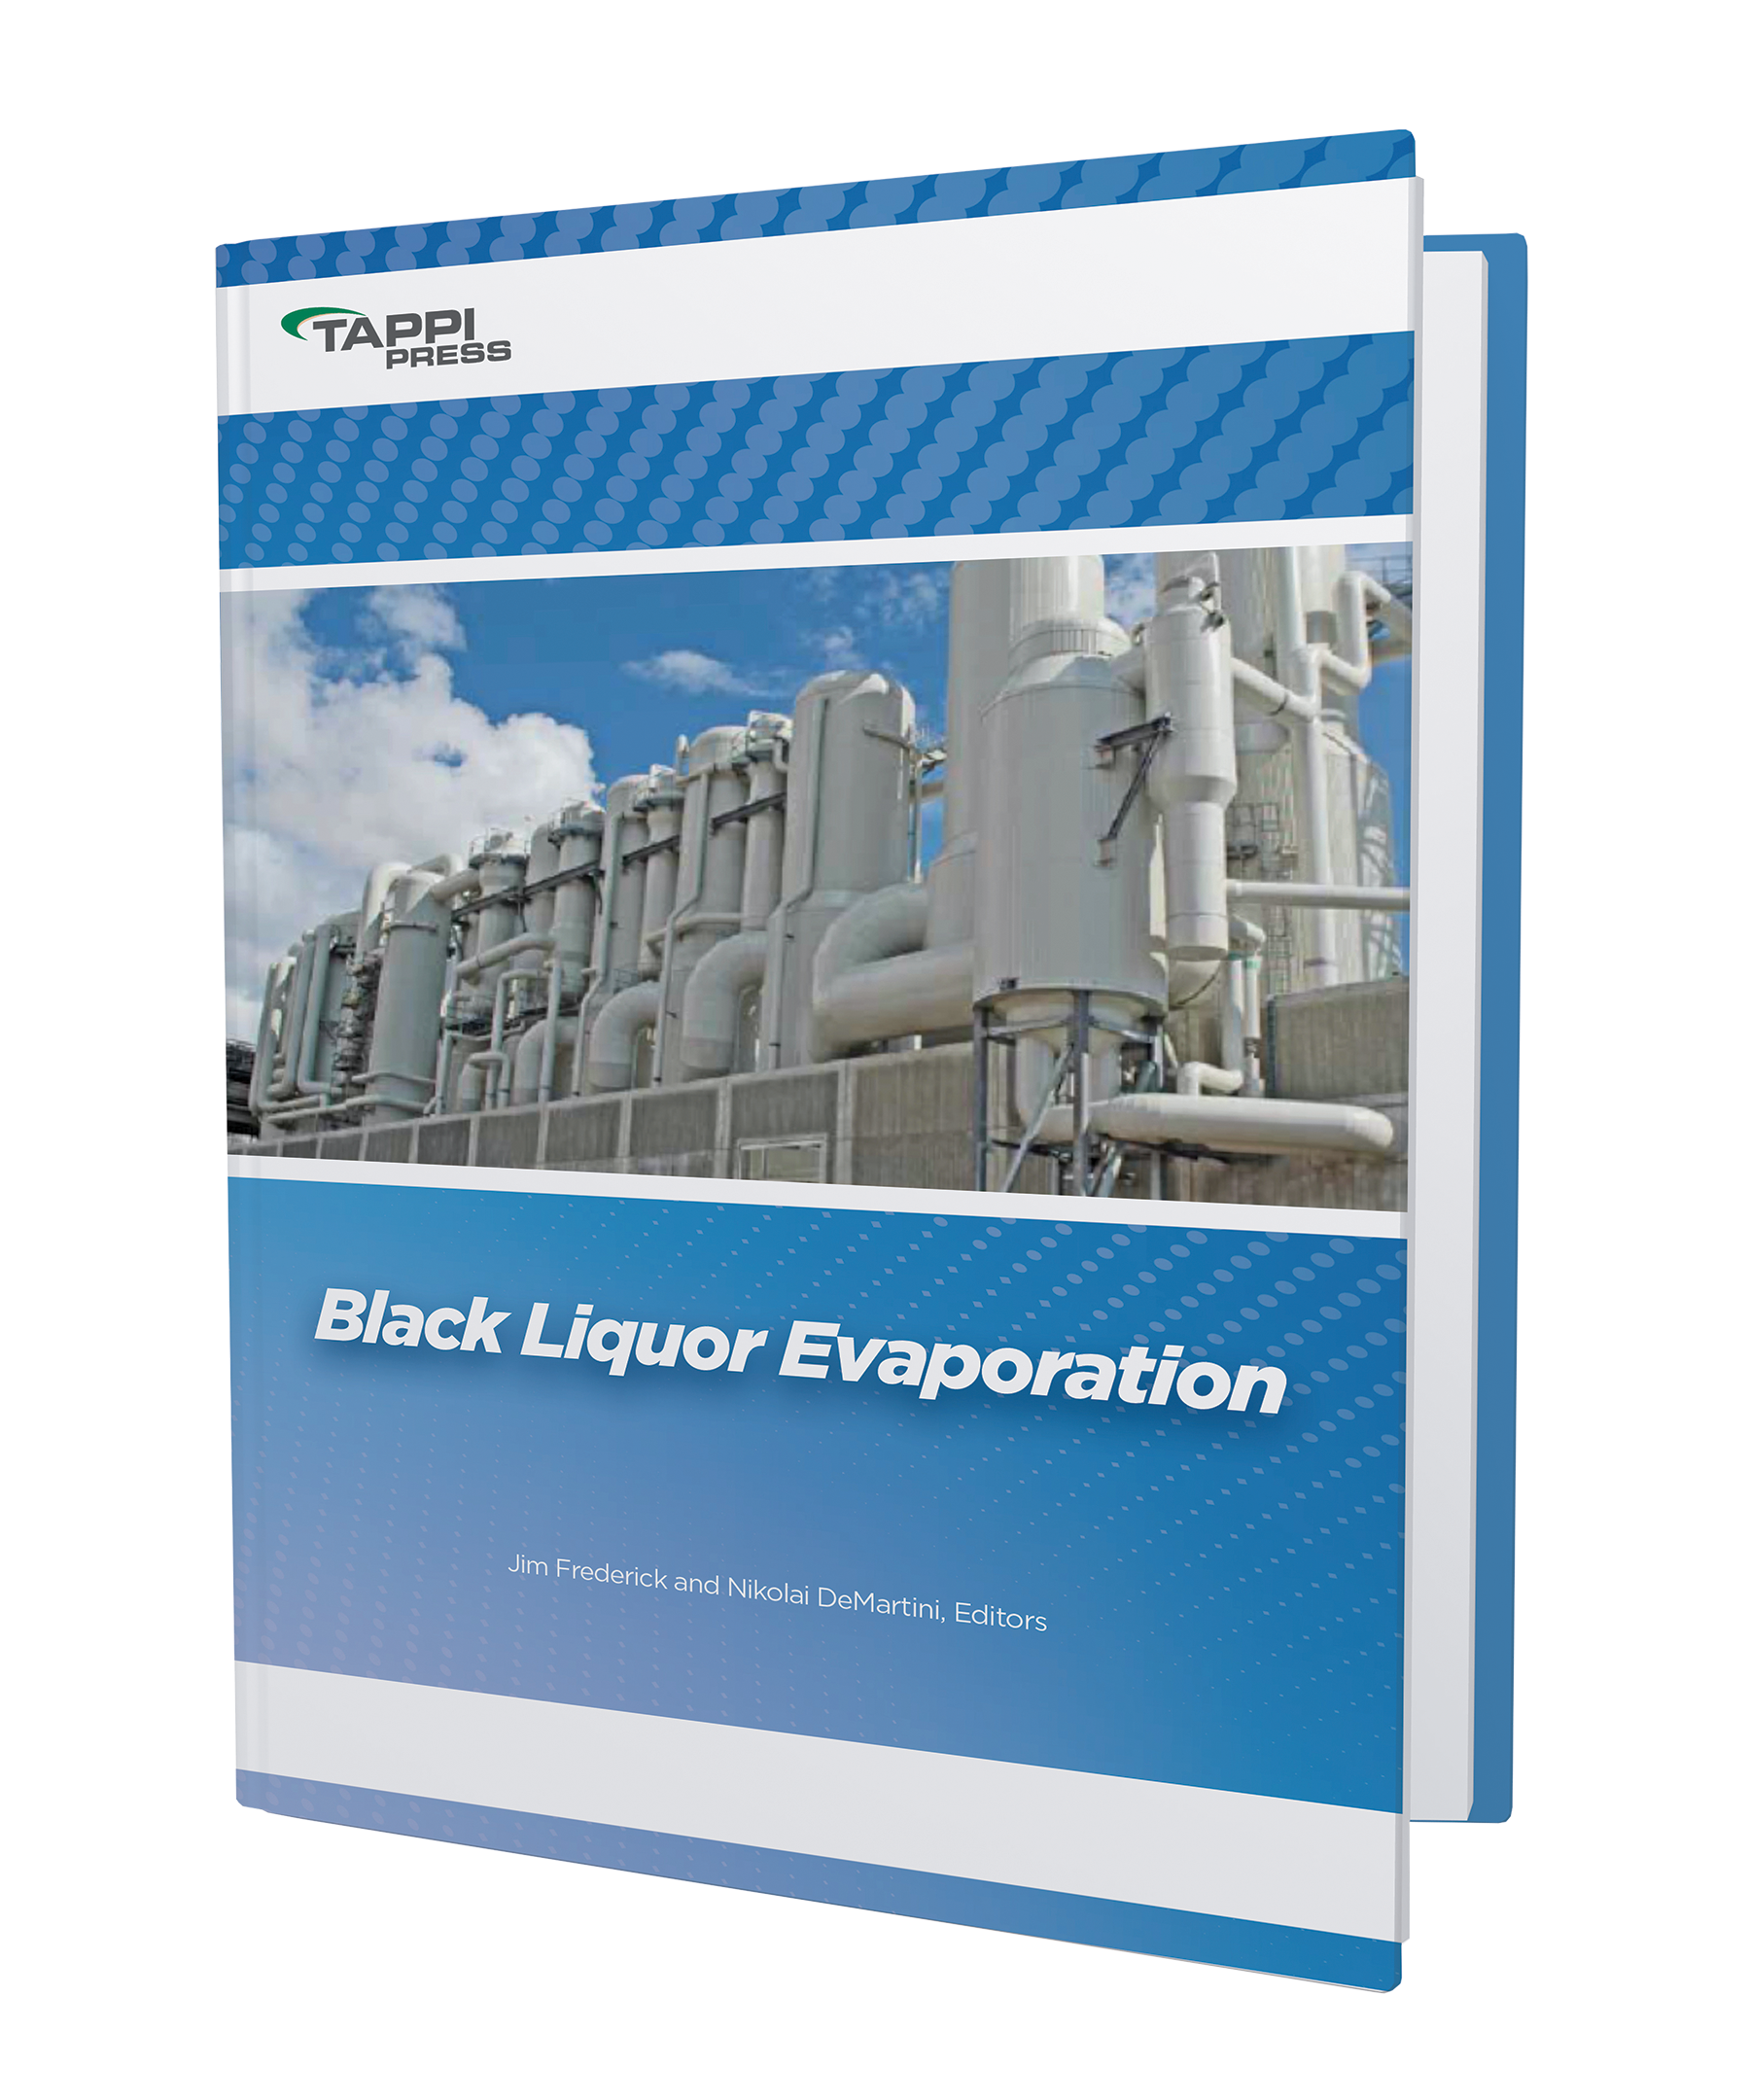 Black Liquor Evaporation